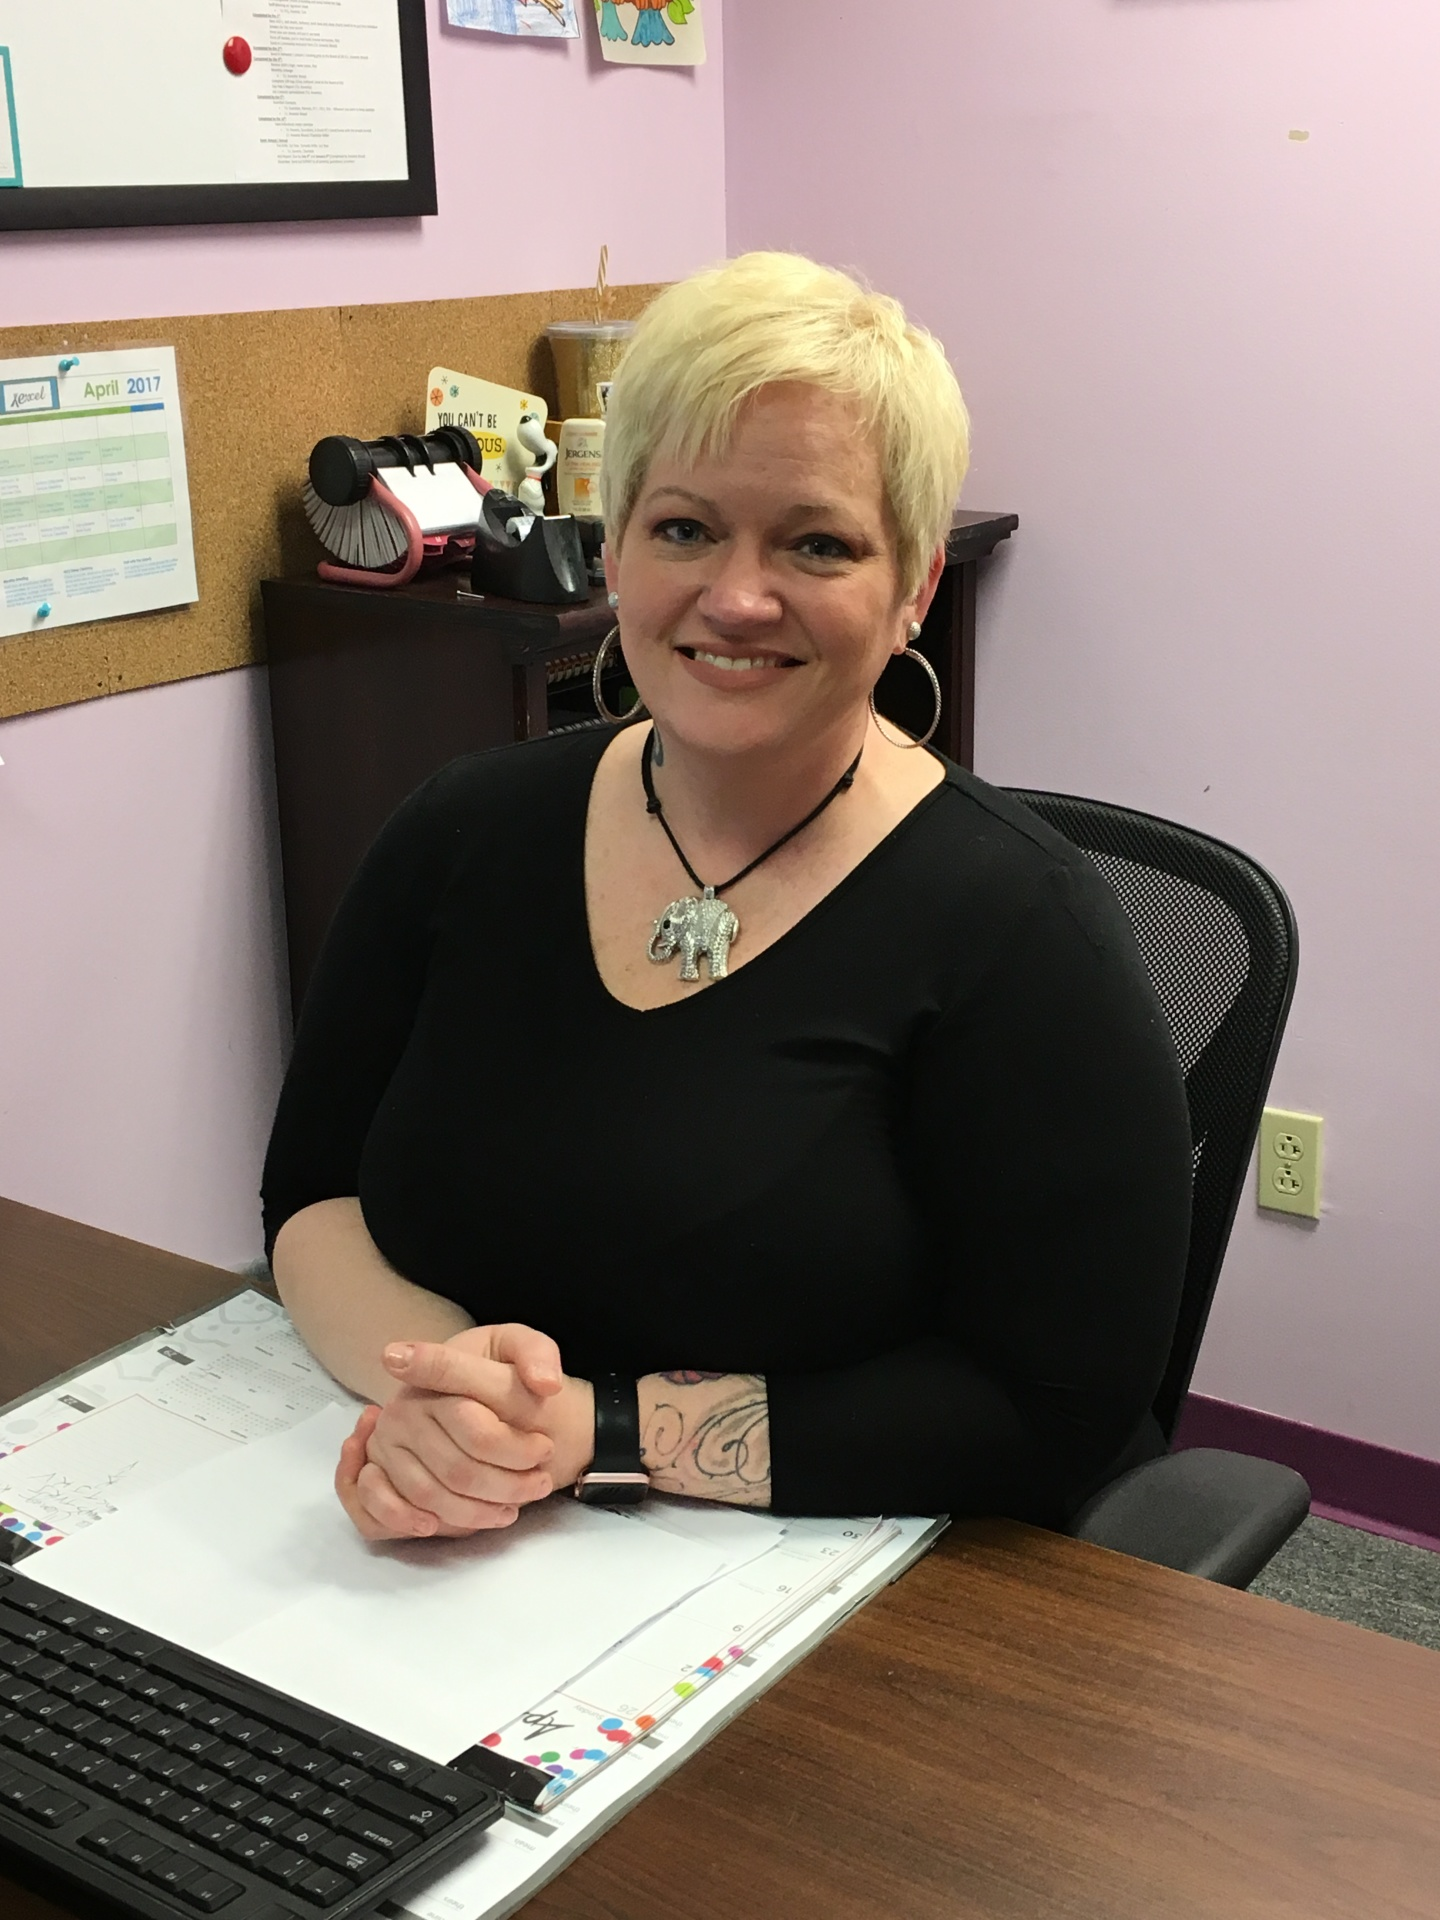 Mandy Grimm:  Program Coordinator